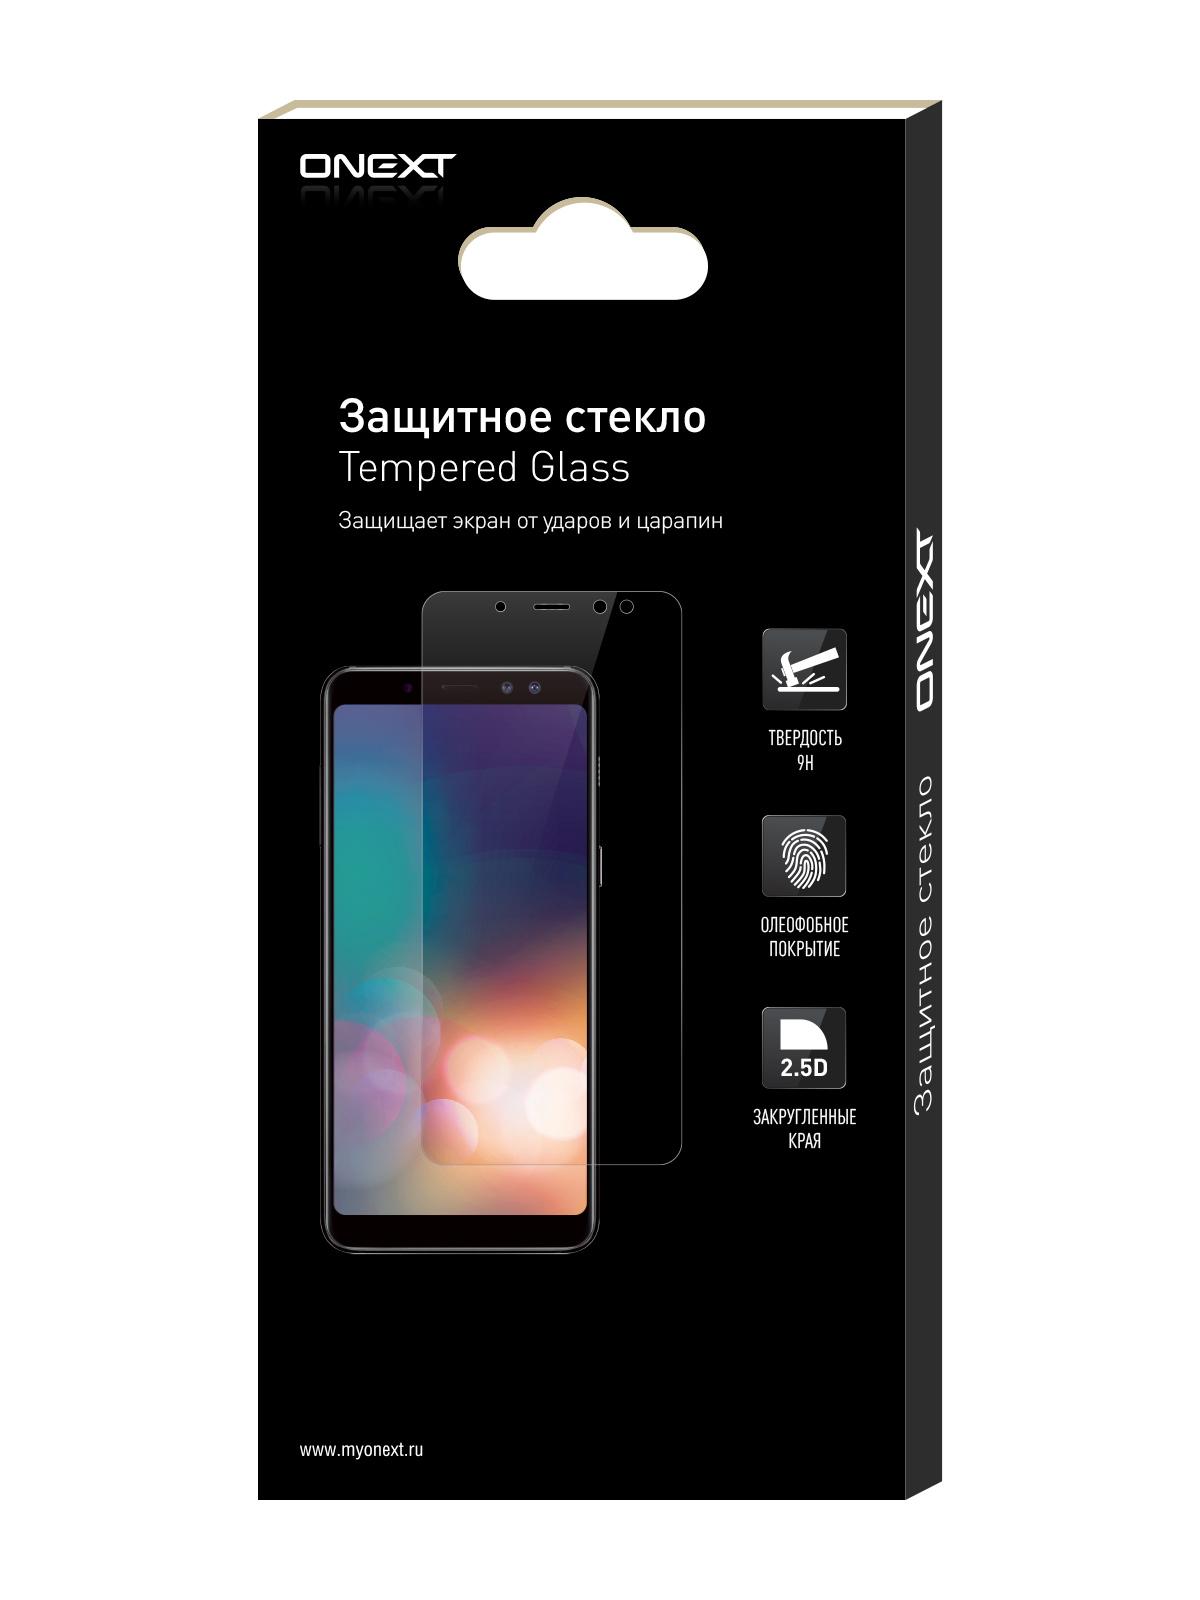 Защитное стекло ONEXT для Asus ZenFone Max (ZC550KL)